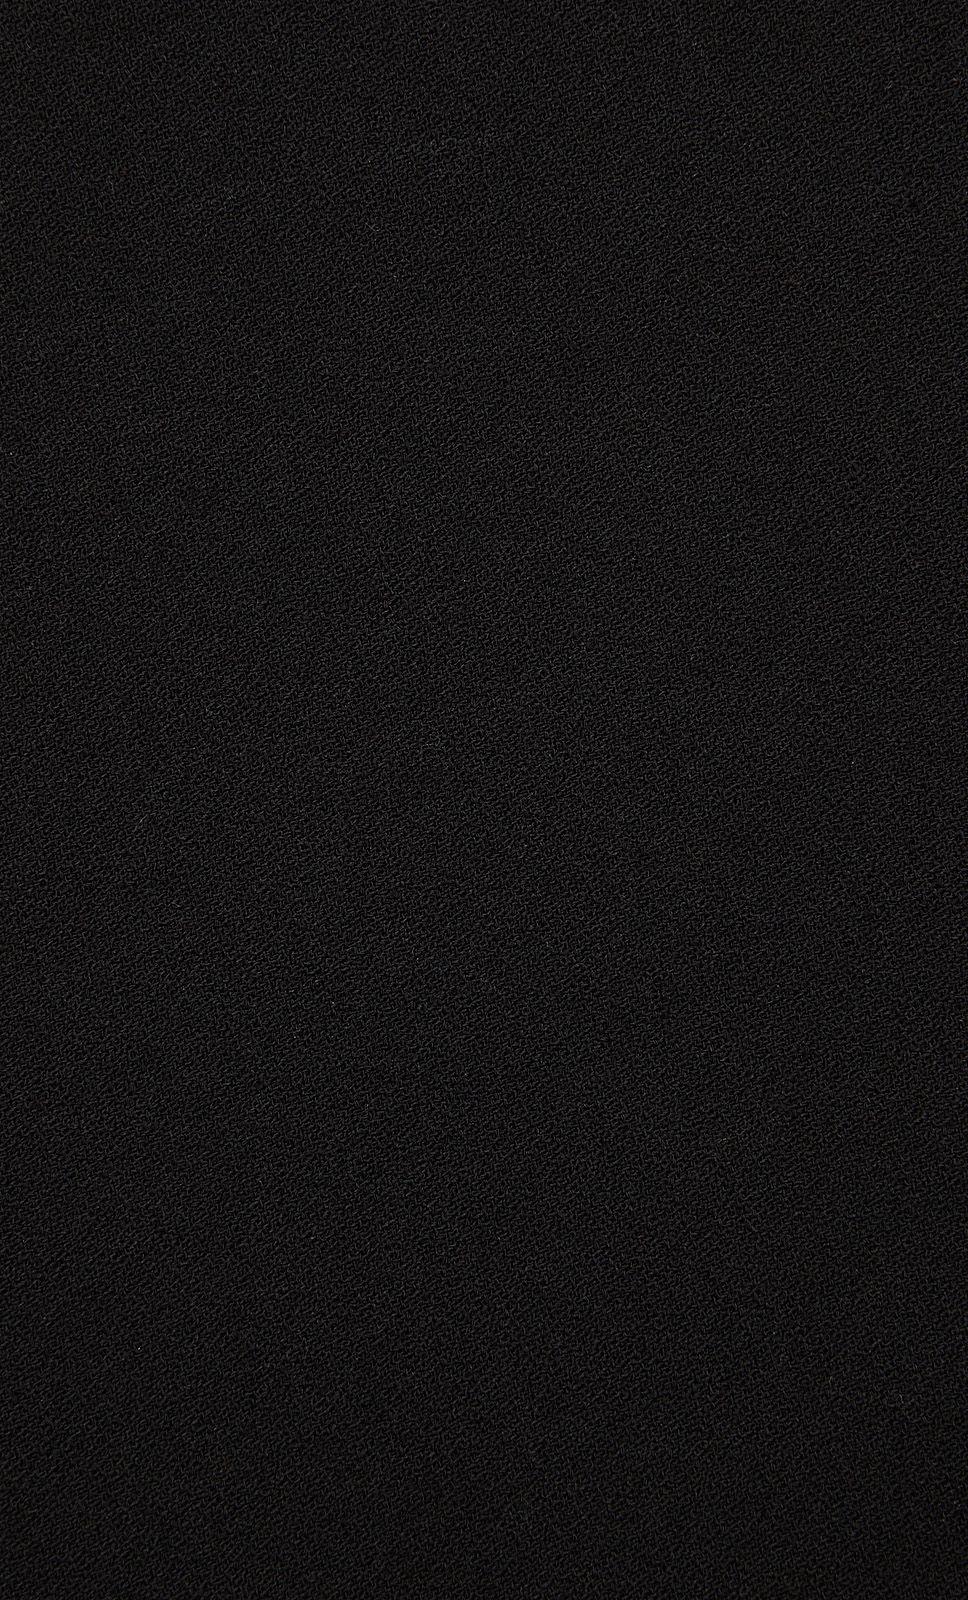 Woven-Crepe-Black